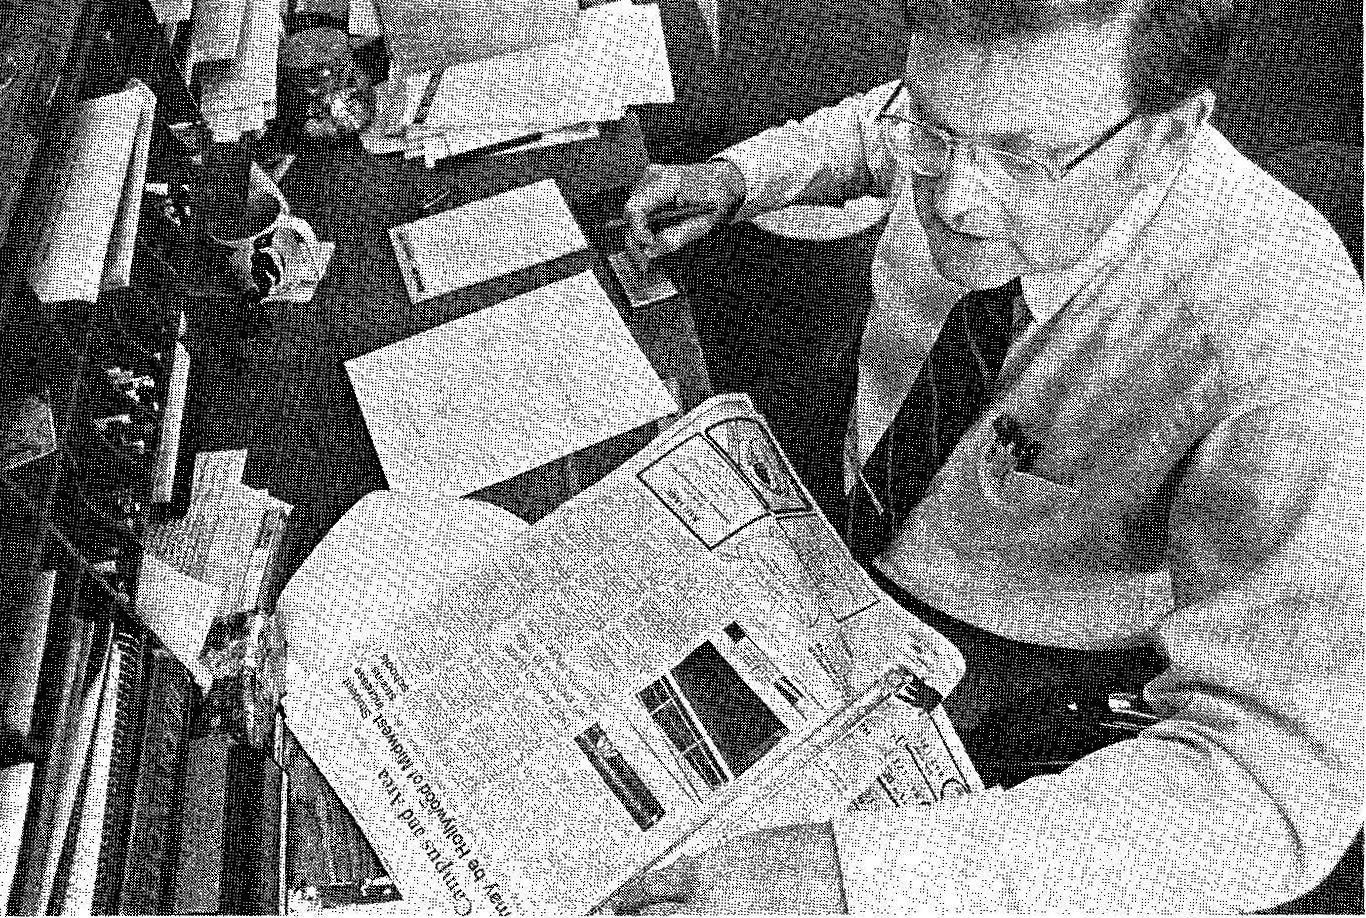 From the Fall 1978 Jayhawk Journalist